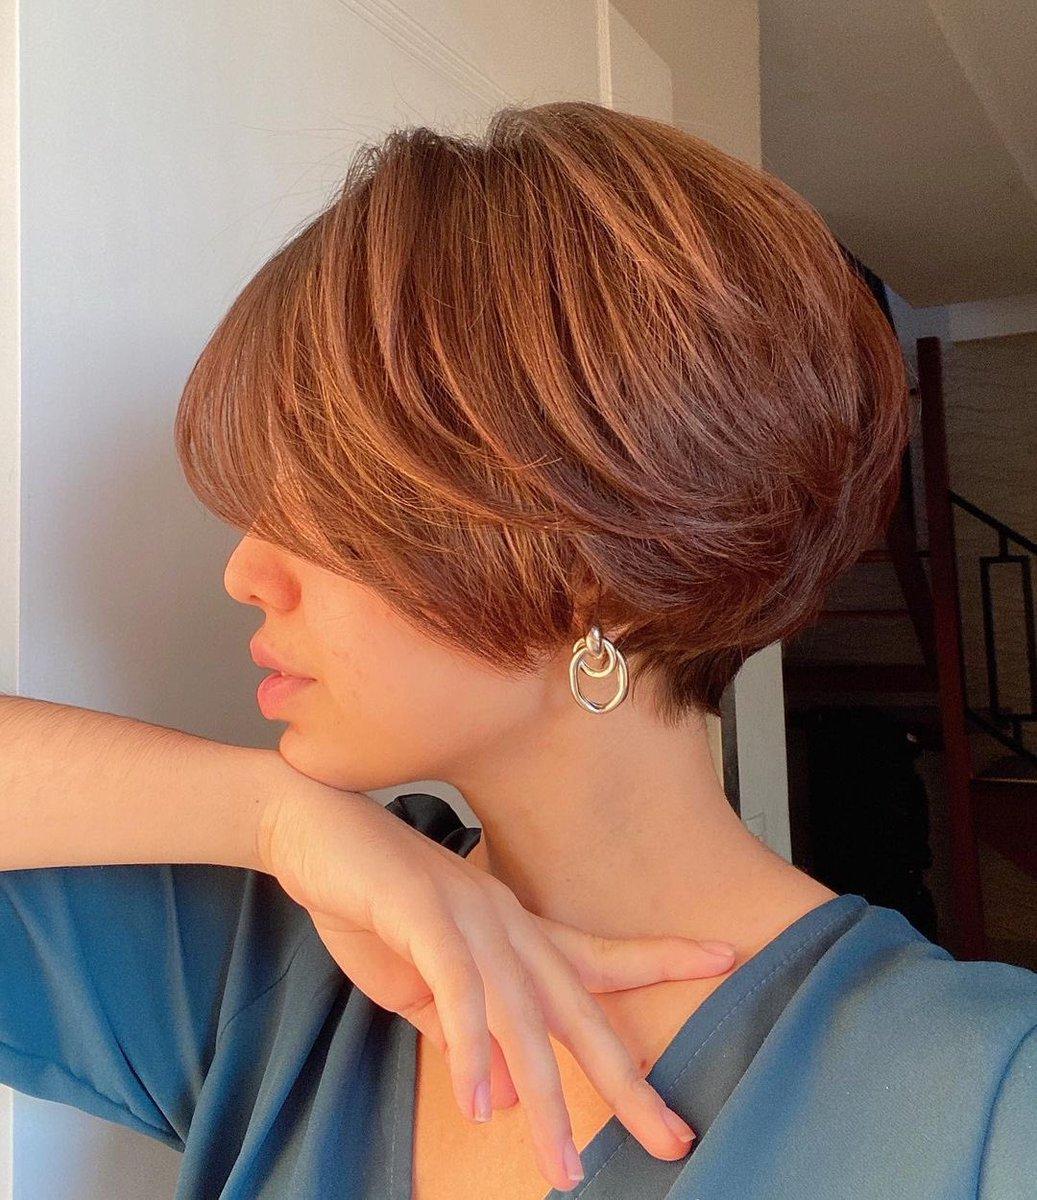 Side face  #haircut #shorthair by @rcgimenes on @_palomaabessa #photography #salon #aheadhairmedia  #aheadhairtrends #lonewong #撮影 #美容室 #短髮  @HairAhead https://t.co/HmgcpyJLR8